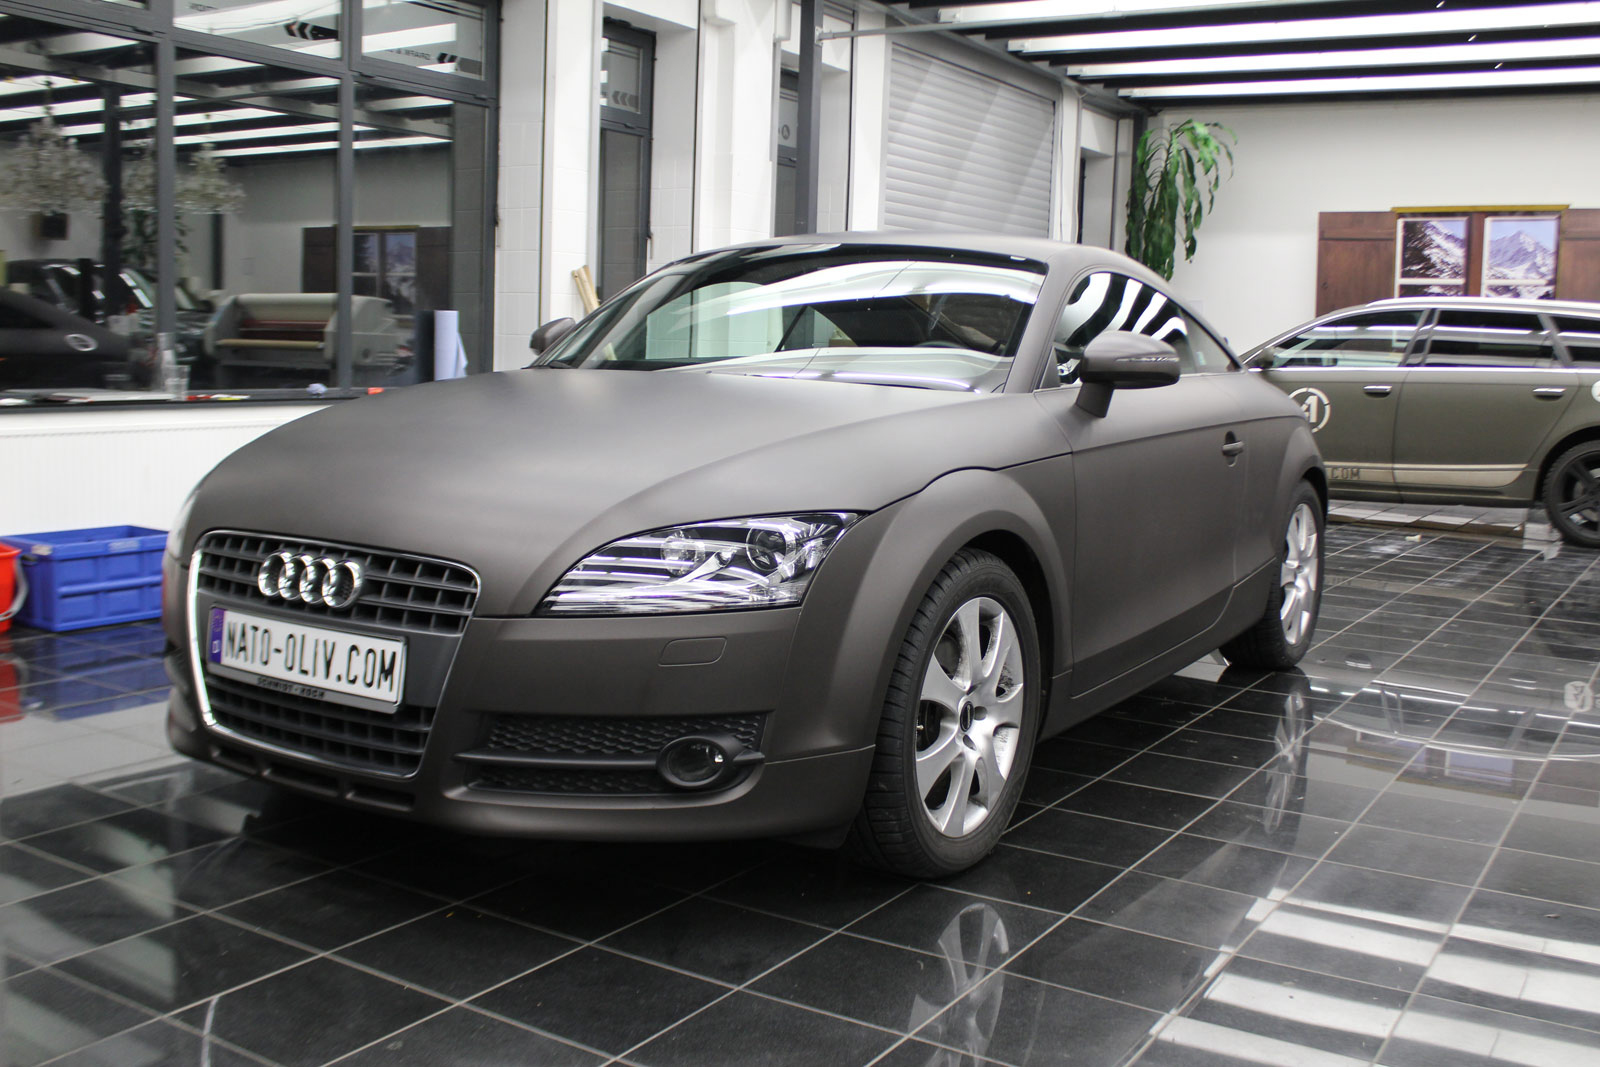 Audi_TT_Braun_Matt_Metallic_Branding_04